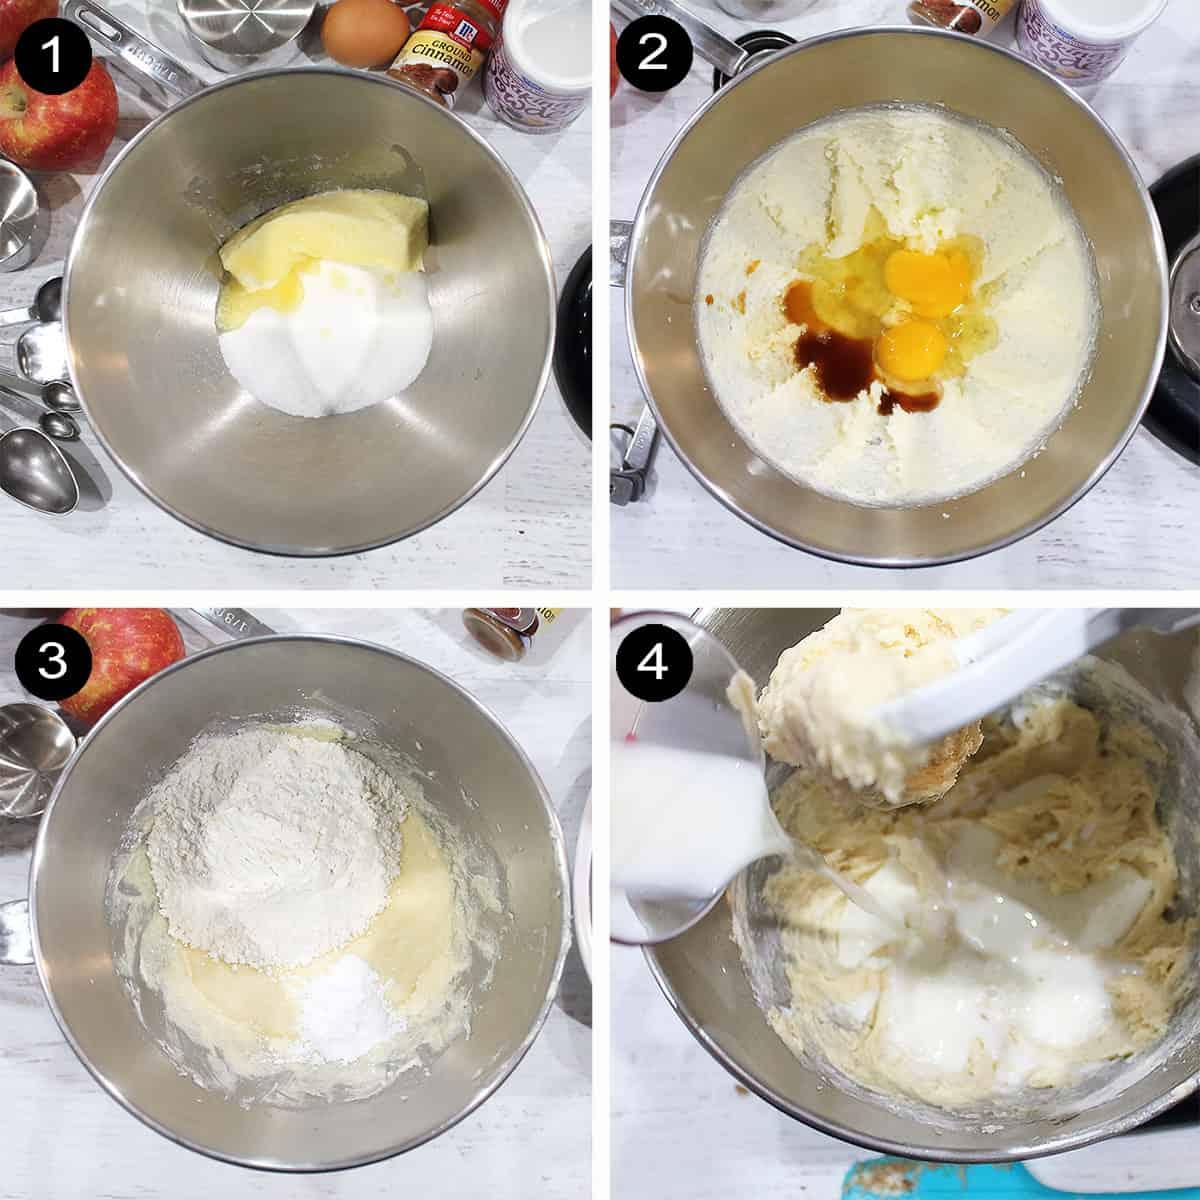 Collage of steps to make bread batter.